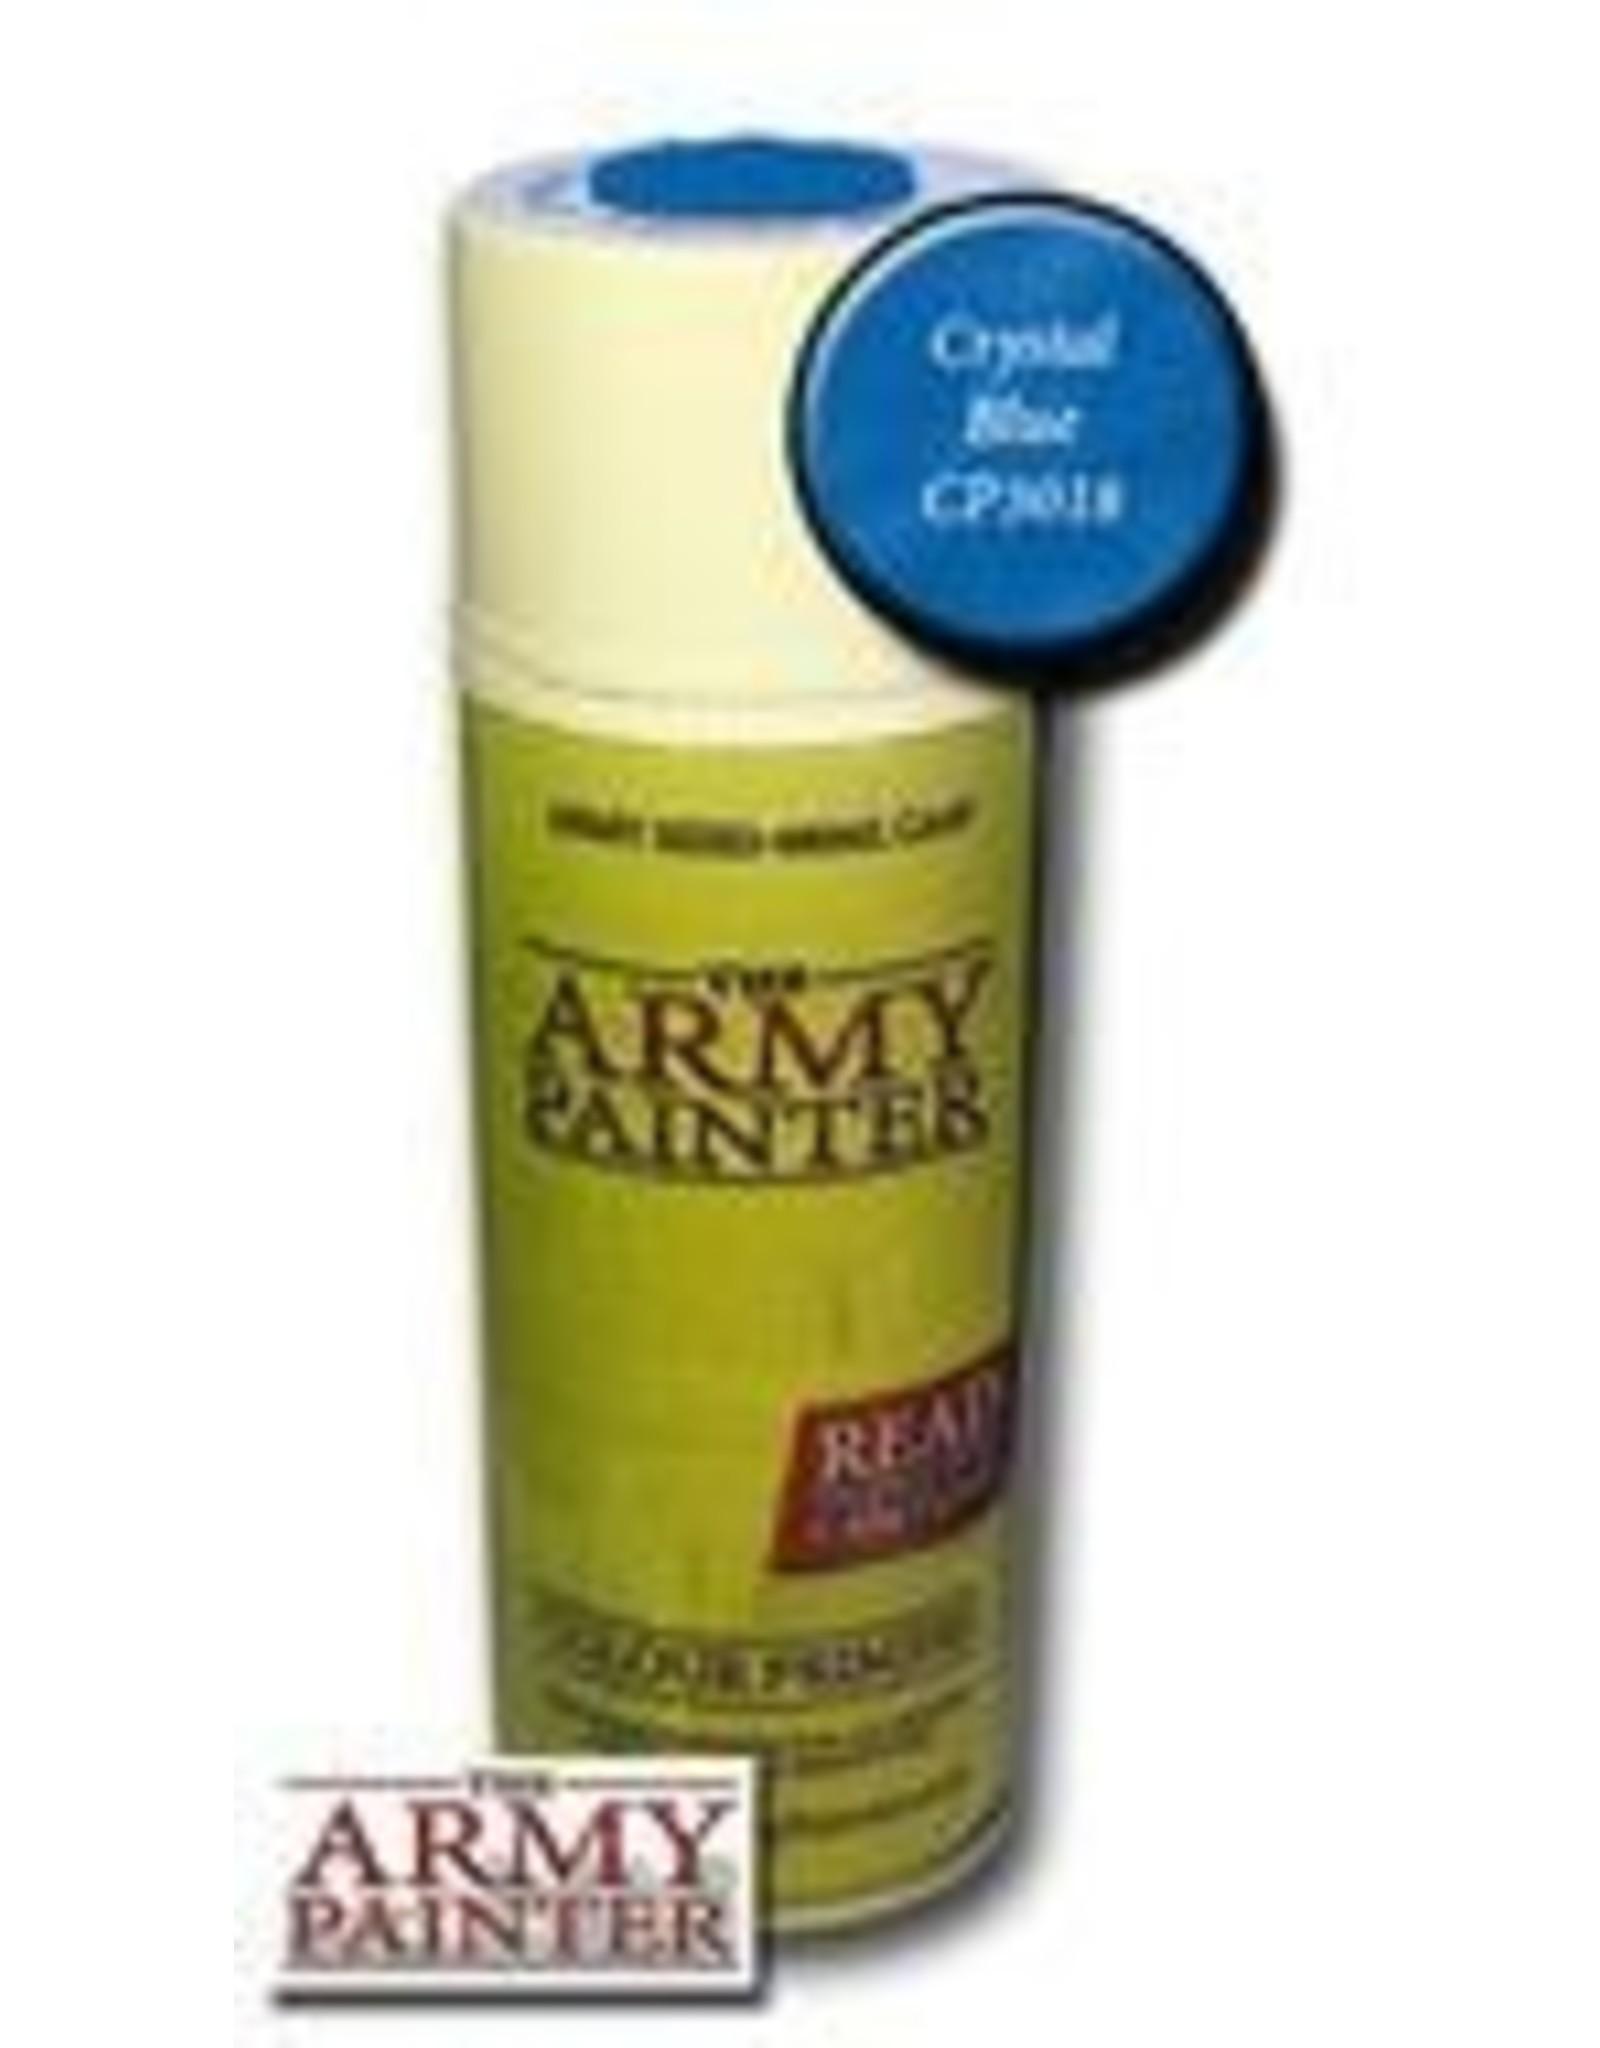 Army Painter Colour Primer: Crystal Blue